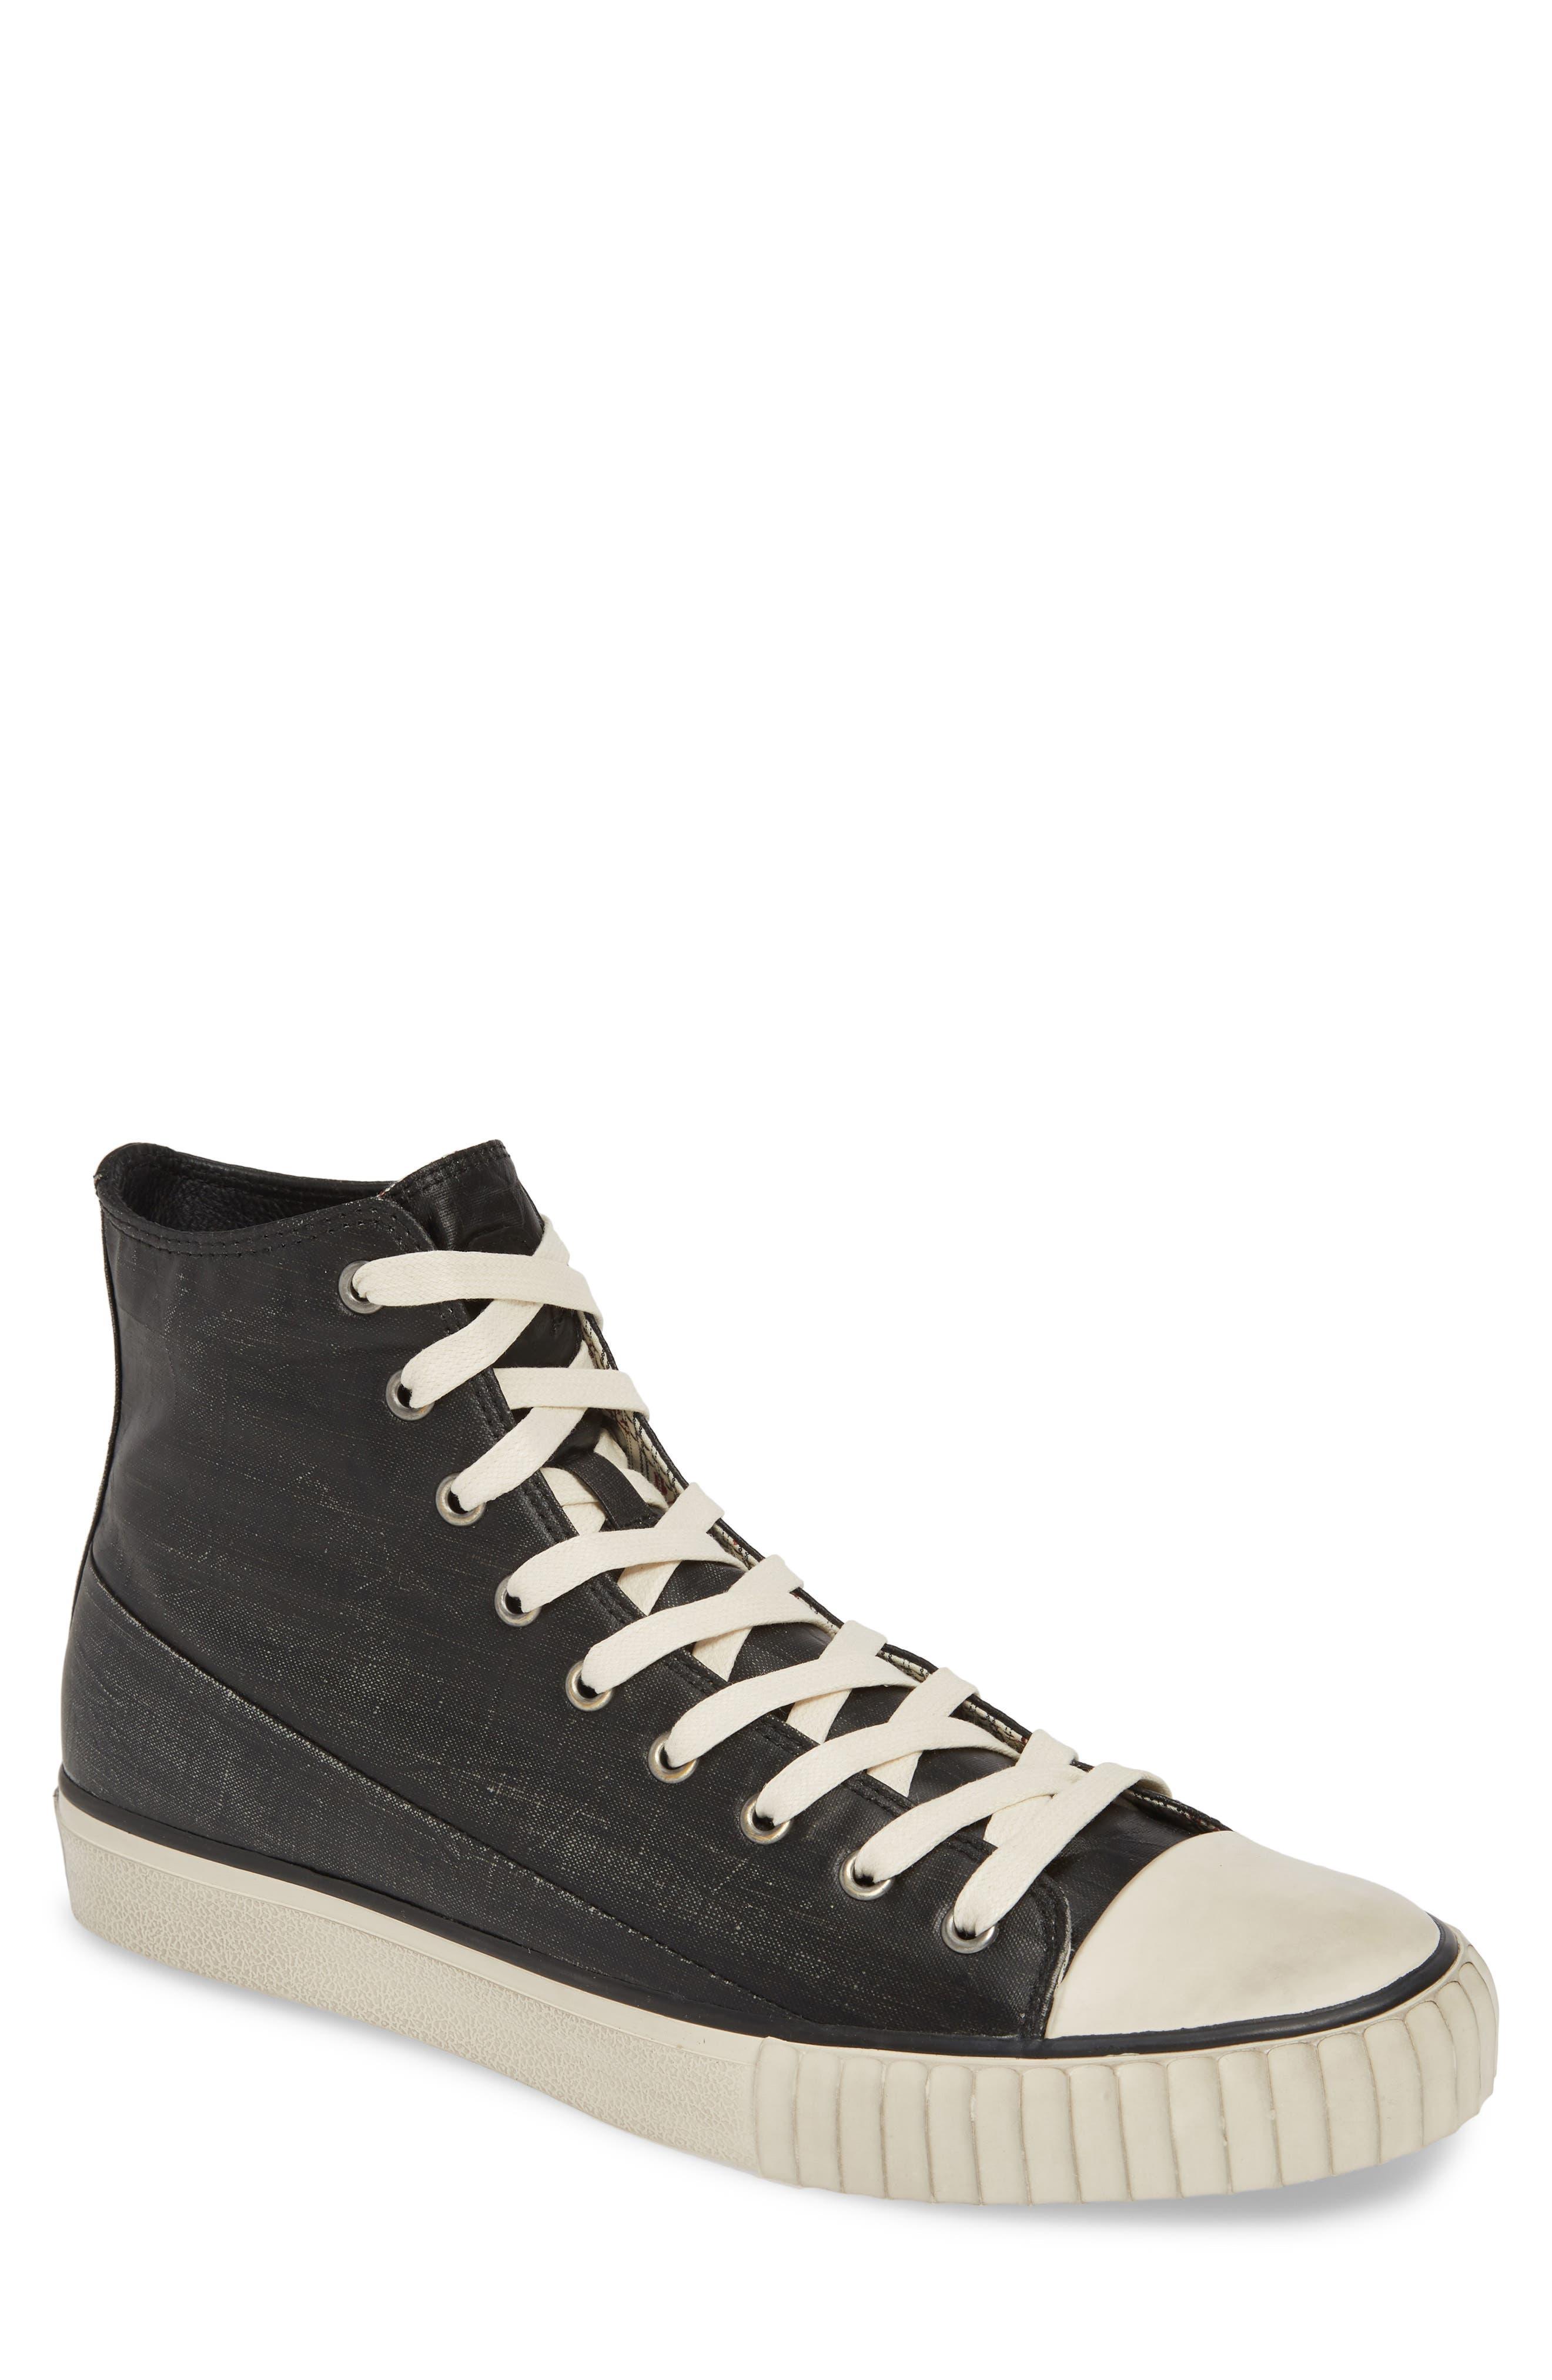 Bootleg By John Varvatos High Top Sneaker, Black